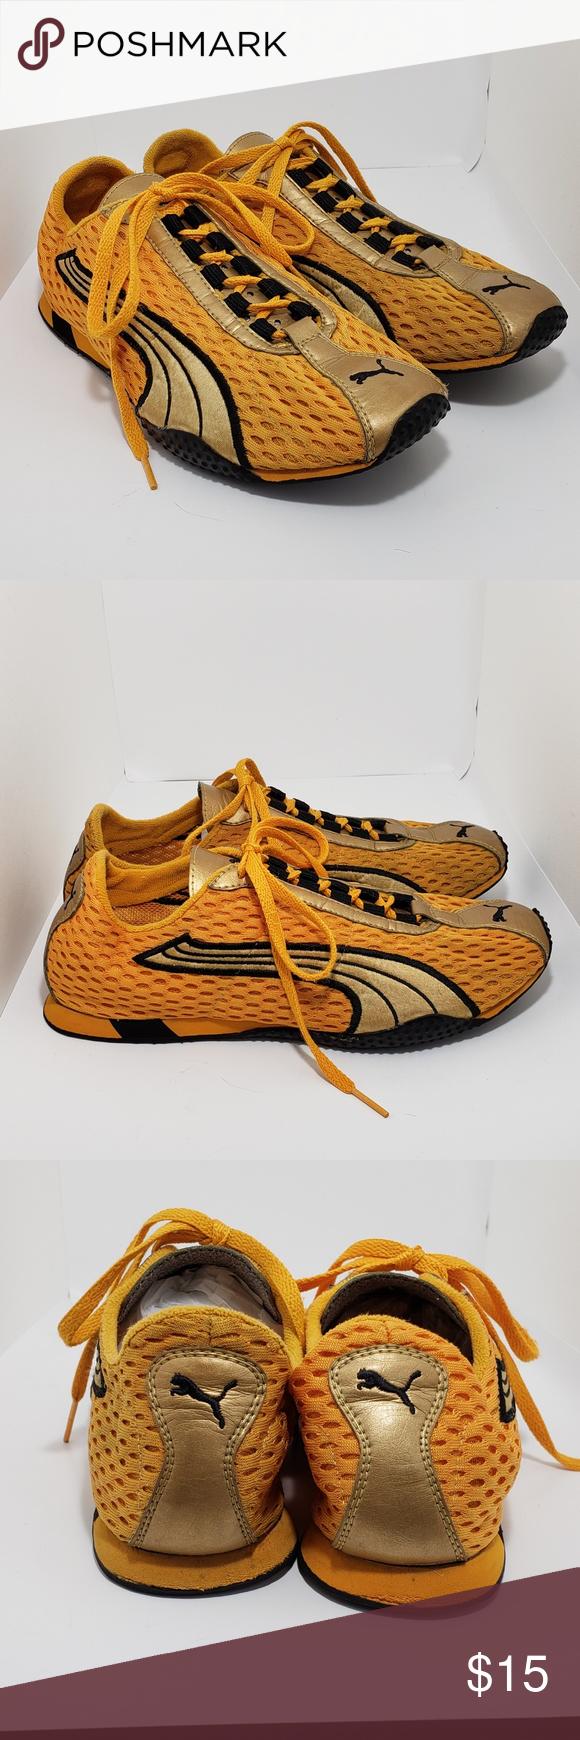 Puma trainers orange gold size 7.5 in